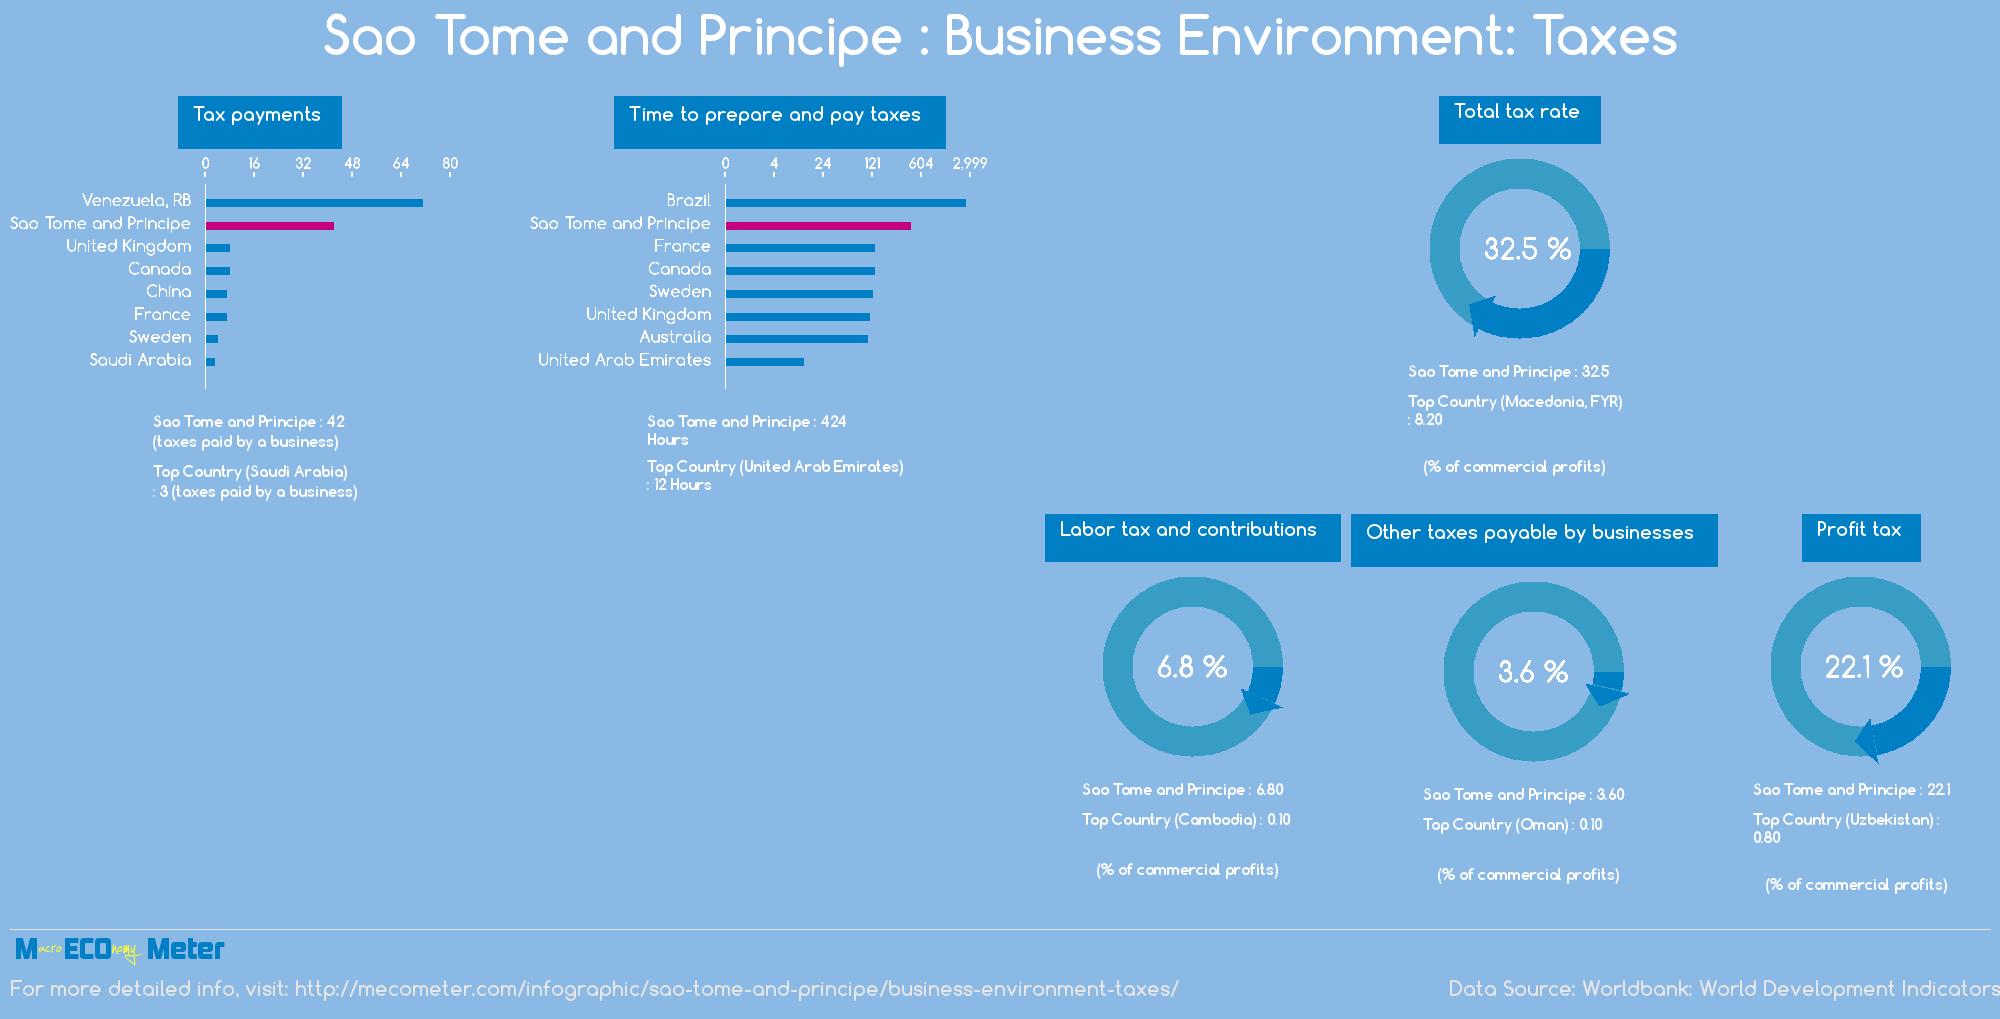 Sao Tome and Principe : Business Environment: Taxes